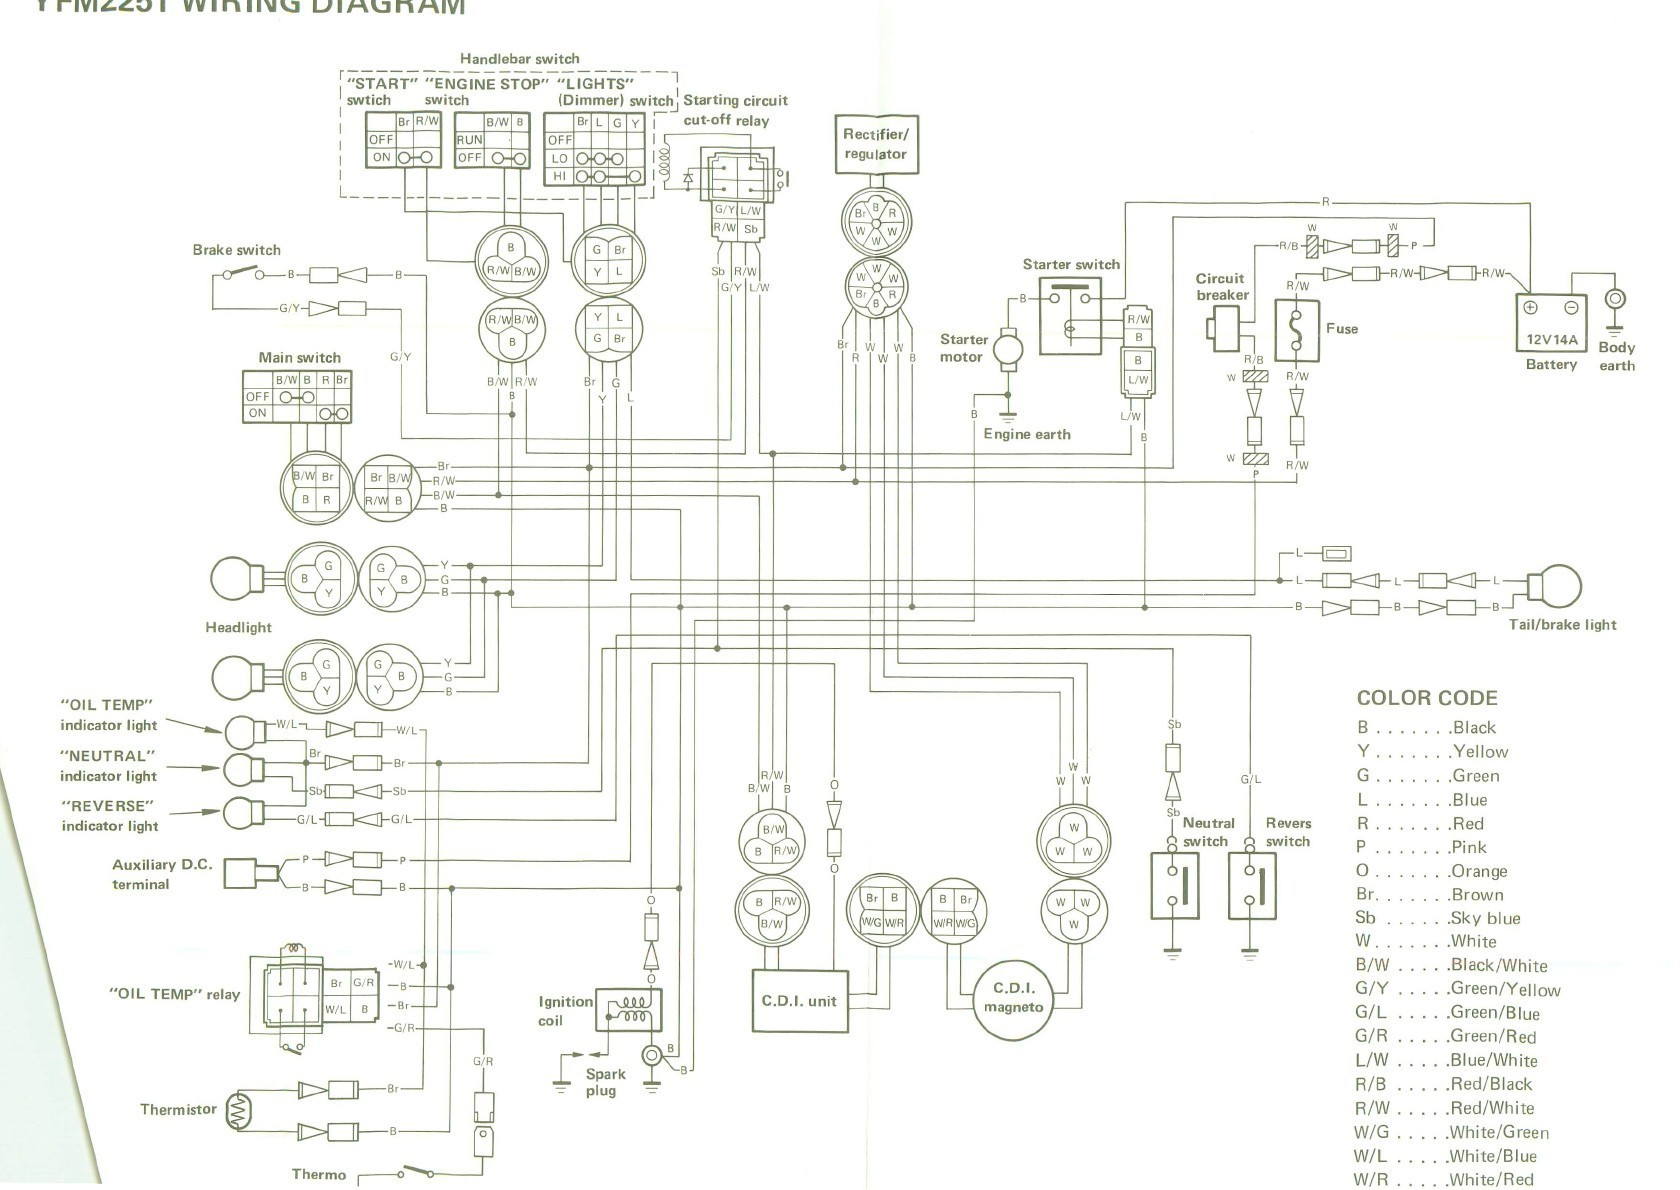 hight resolution of moto 4 wiring diagram online wiring diagrammoto 4 wiring diagram wiring diagram m6 yamaha moto 4